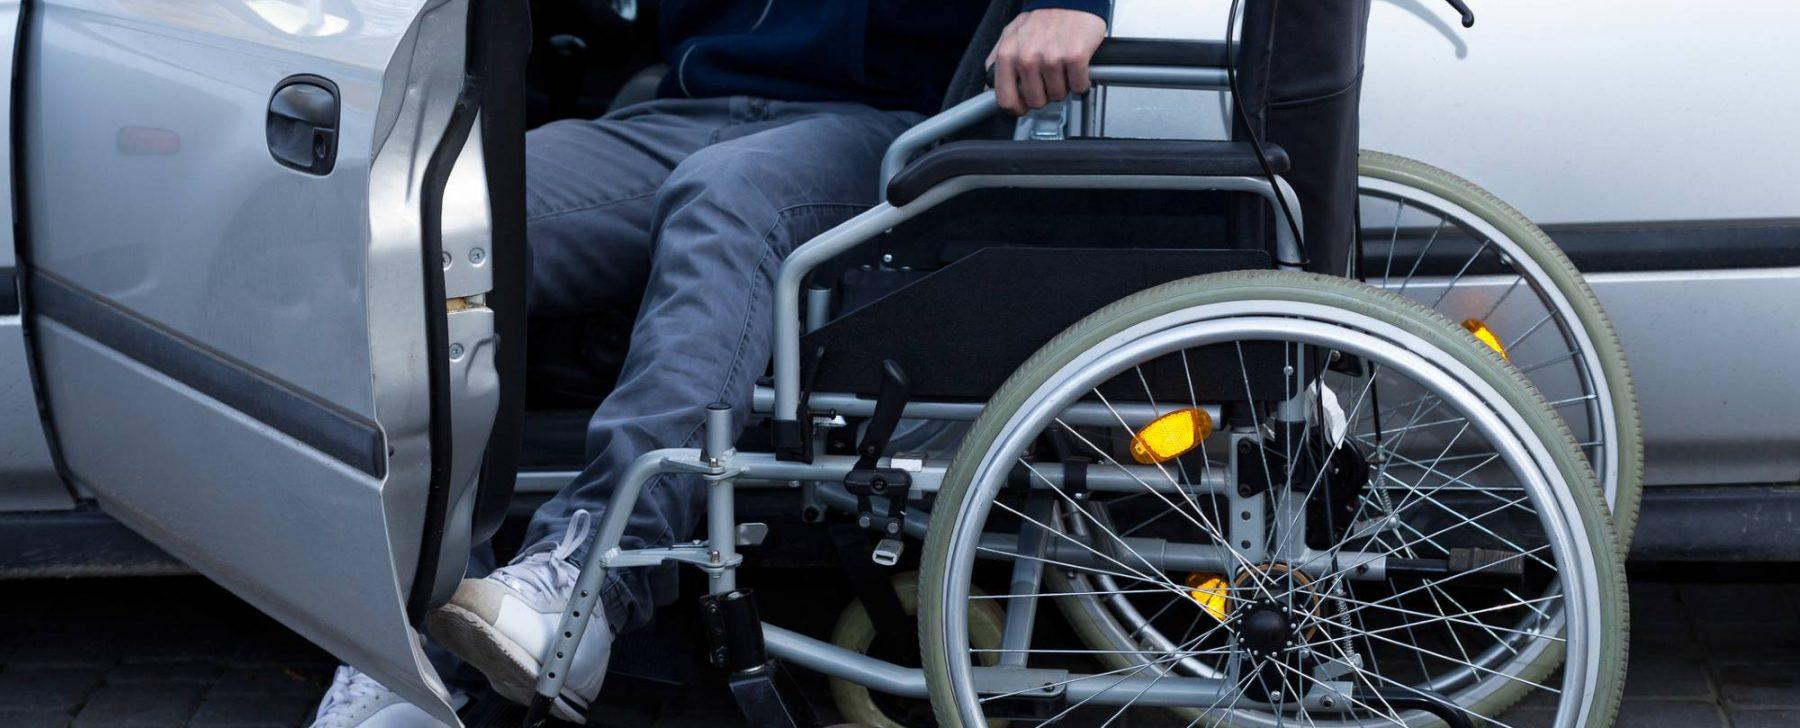 carnet por puntos silla de ruedas